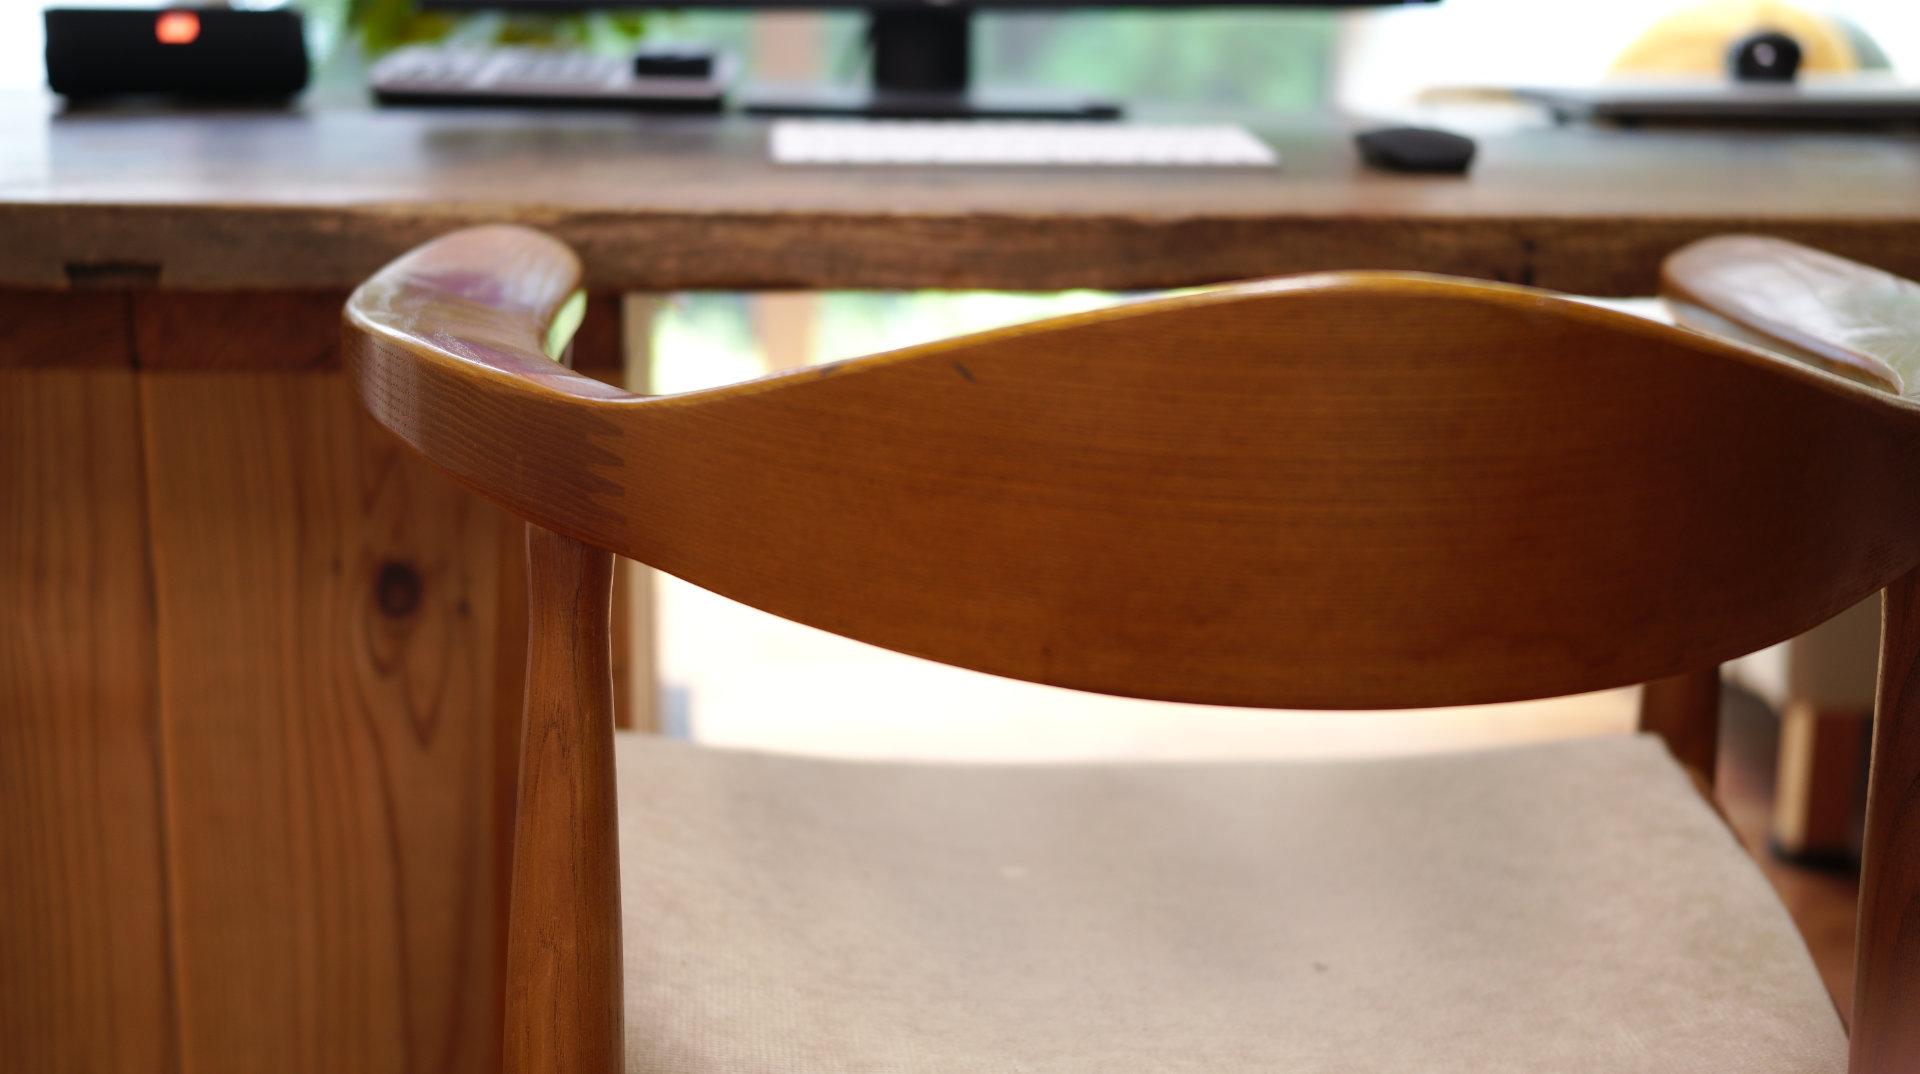 PC&デスク&北欧デザイナーズ木製チェア「PP503 The Chair / ハンス・J・ウェグナー」